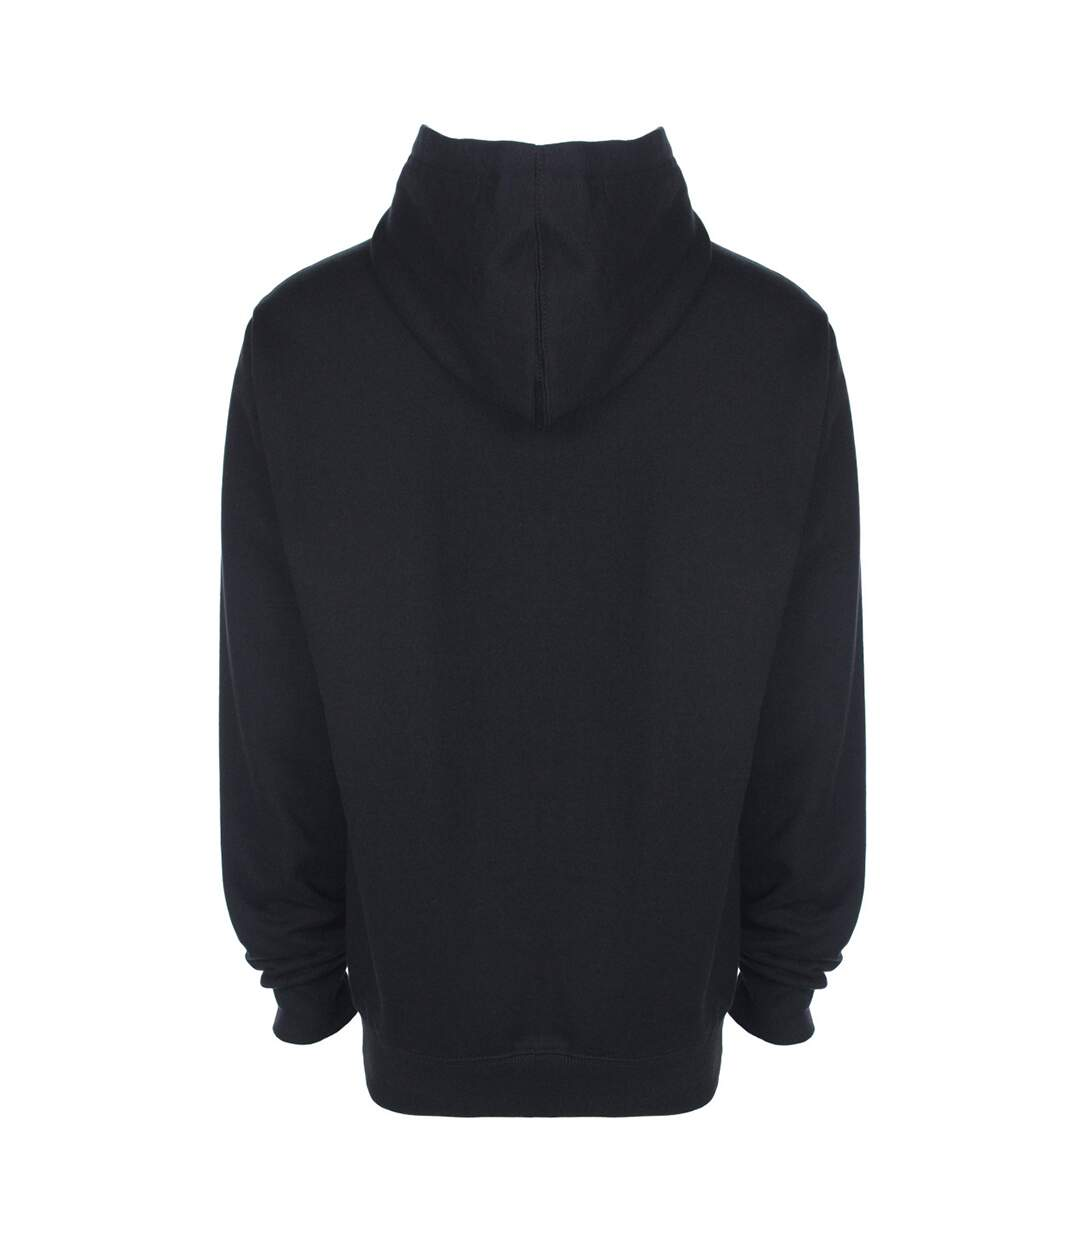 FDM Unisex Tagless Hooded Sweatshirt / Hoodie (Fire Red) - UTBC2031